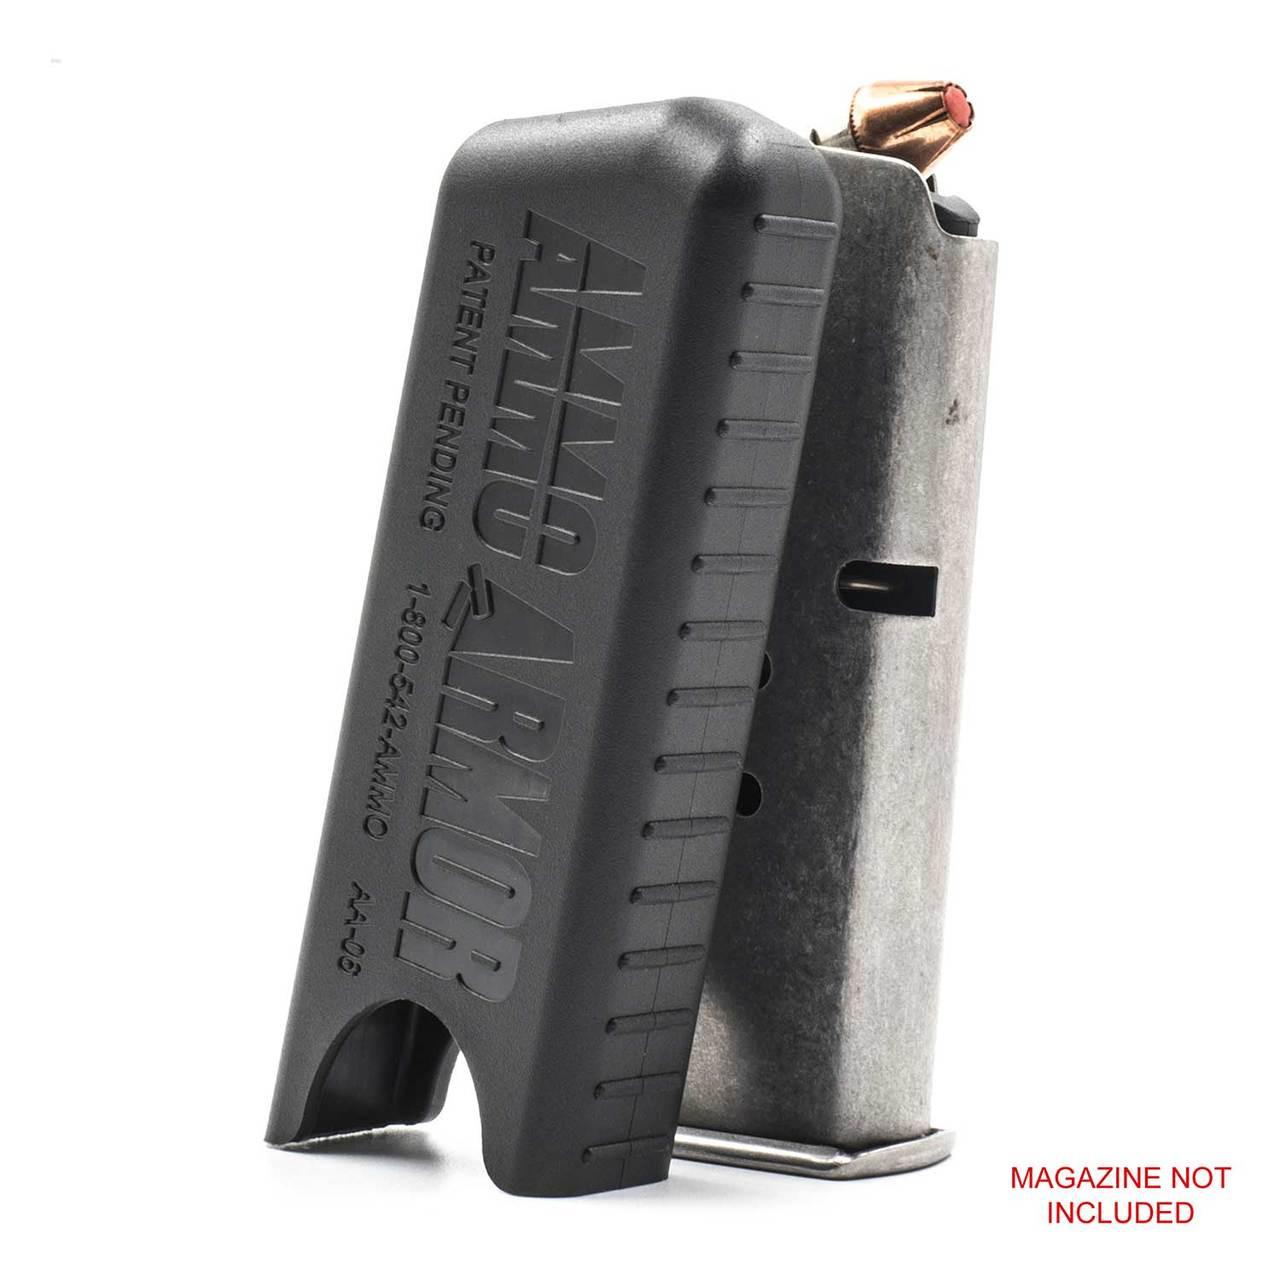 Diamondback DB380 Magazine Protector